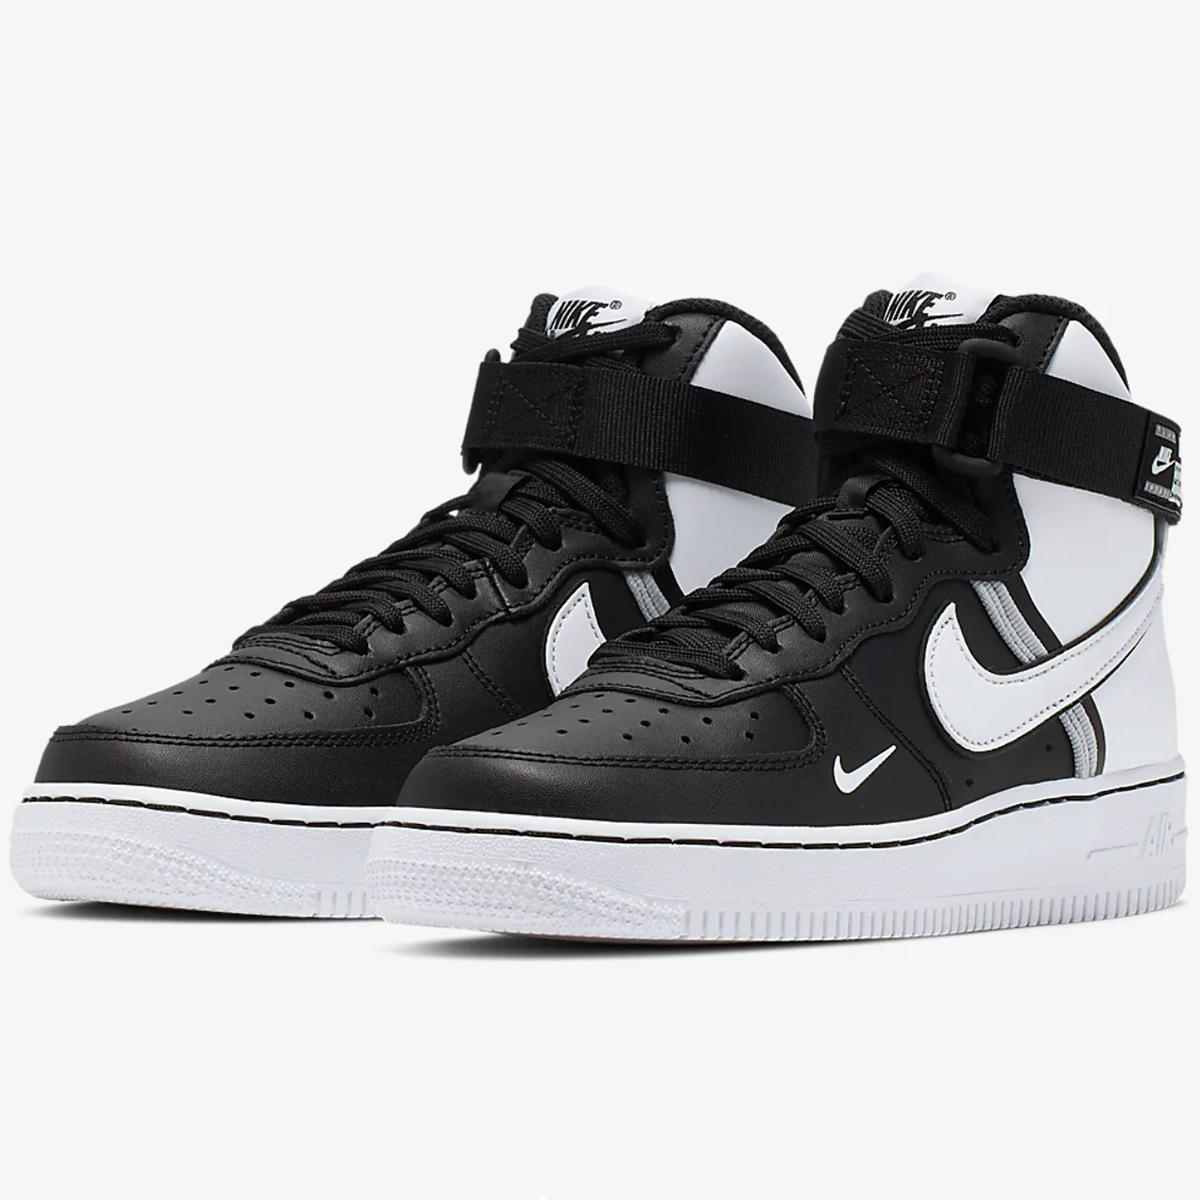 Nike Air Force 1 High LV8 2 GS in schwarz CI2164 010